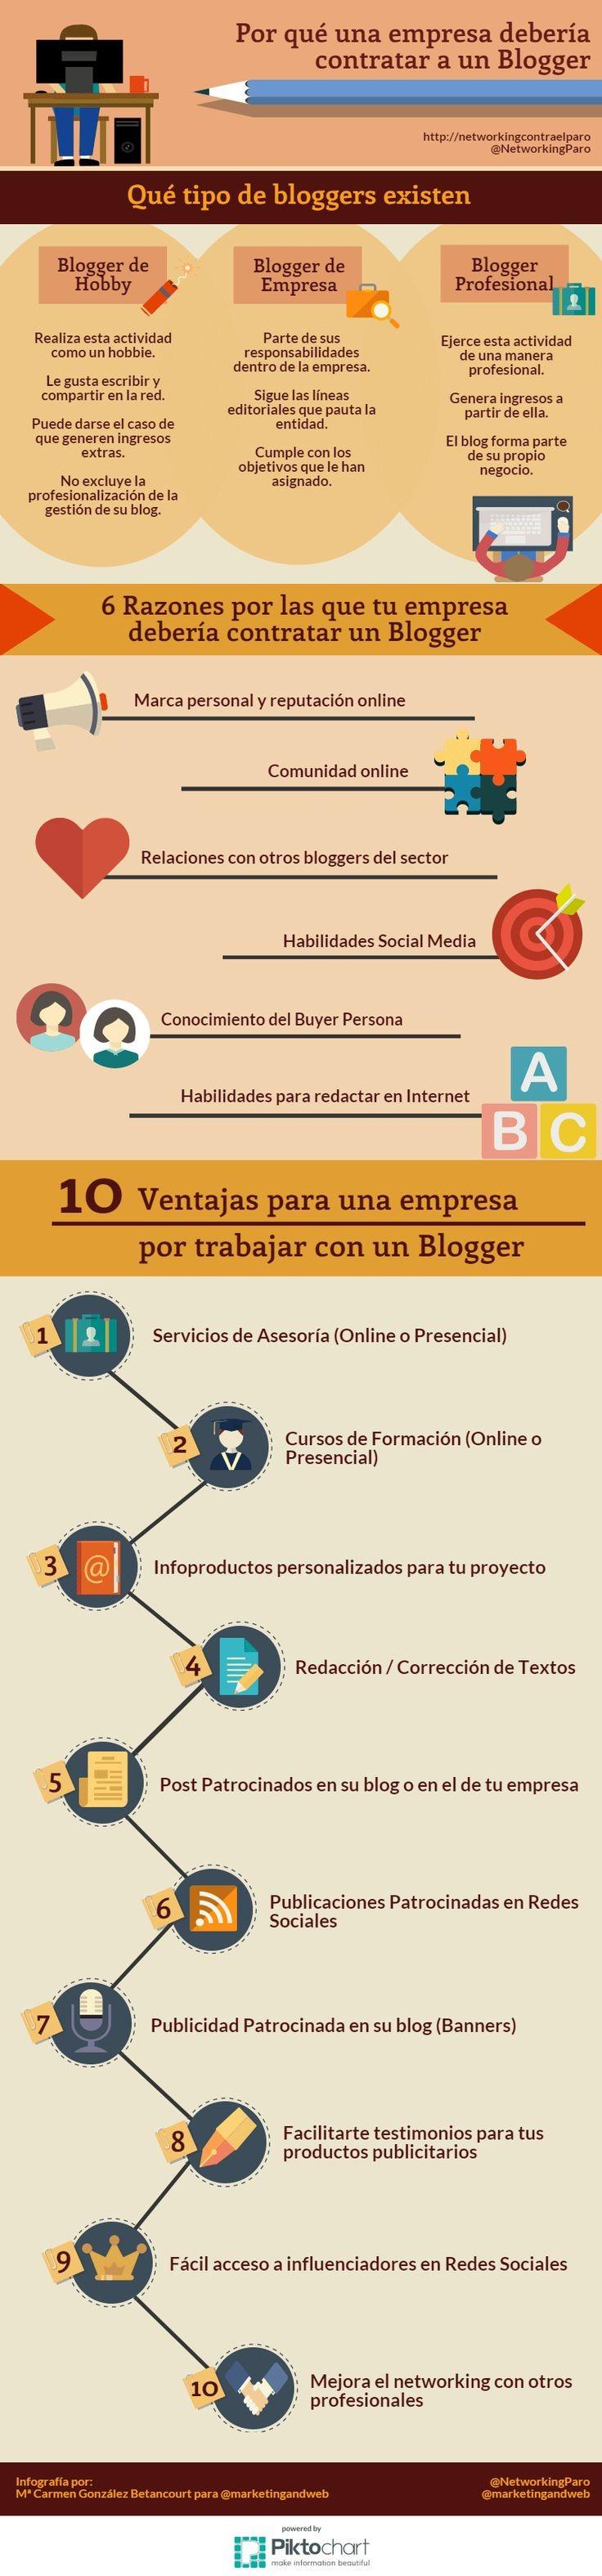 Hola Una infografa sobre Por qué una empresa debe contratar a un Blogger Va